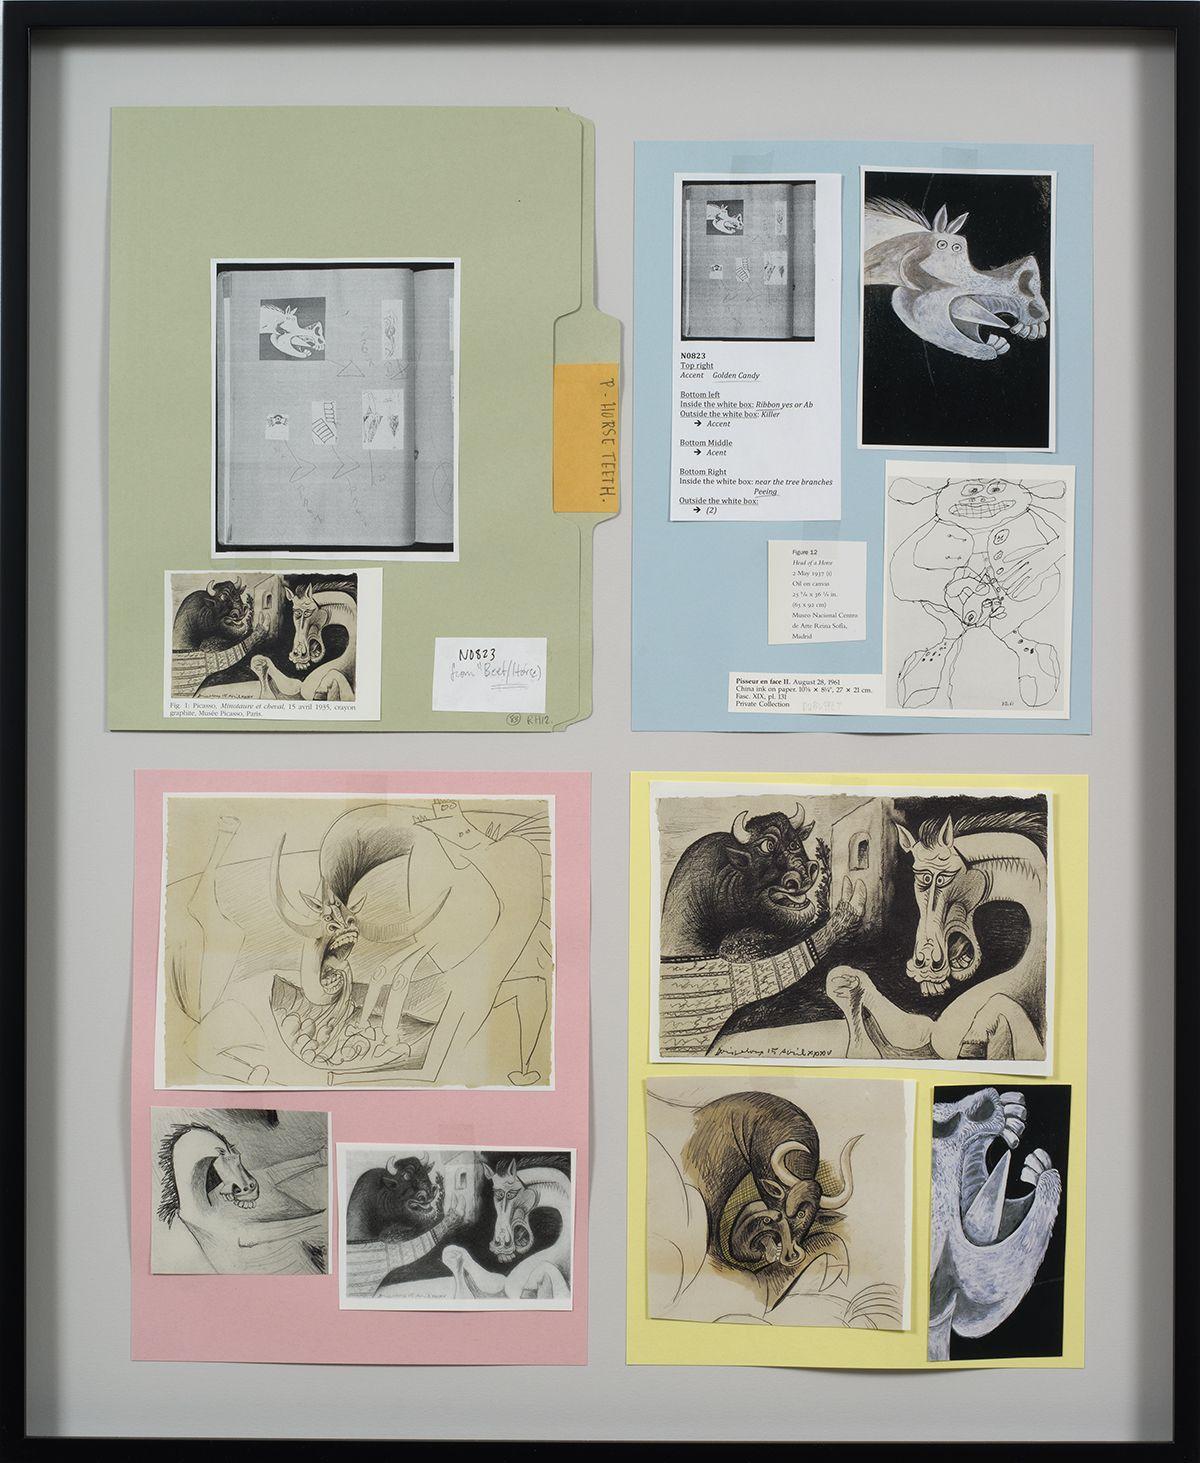 Ankoku 83 (Resource folder: Horse-teeth), 2012, Collage, 27 1/8  x 22 1/4 x 1 1/2 inches (68.9 x 56.5 x 3.8 cm)